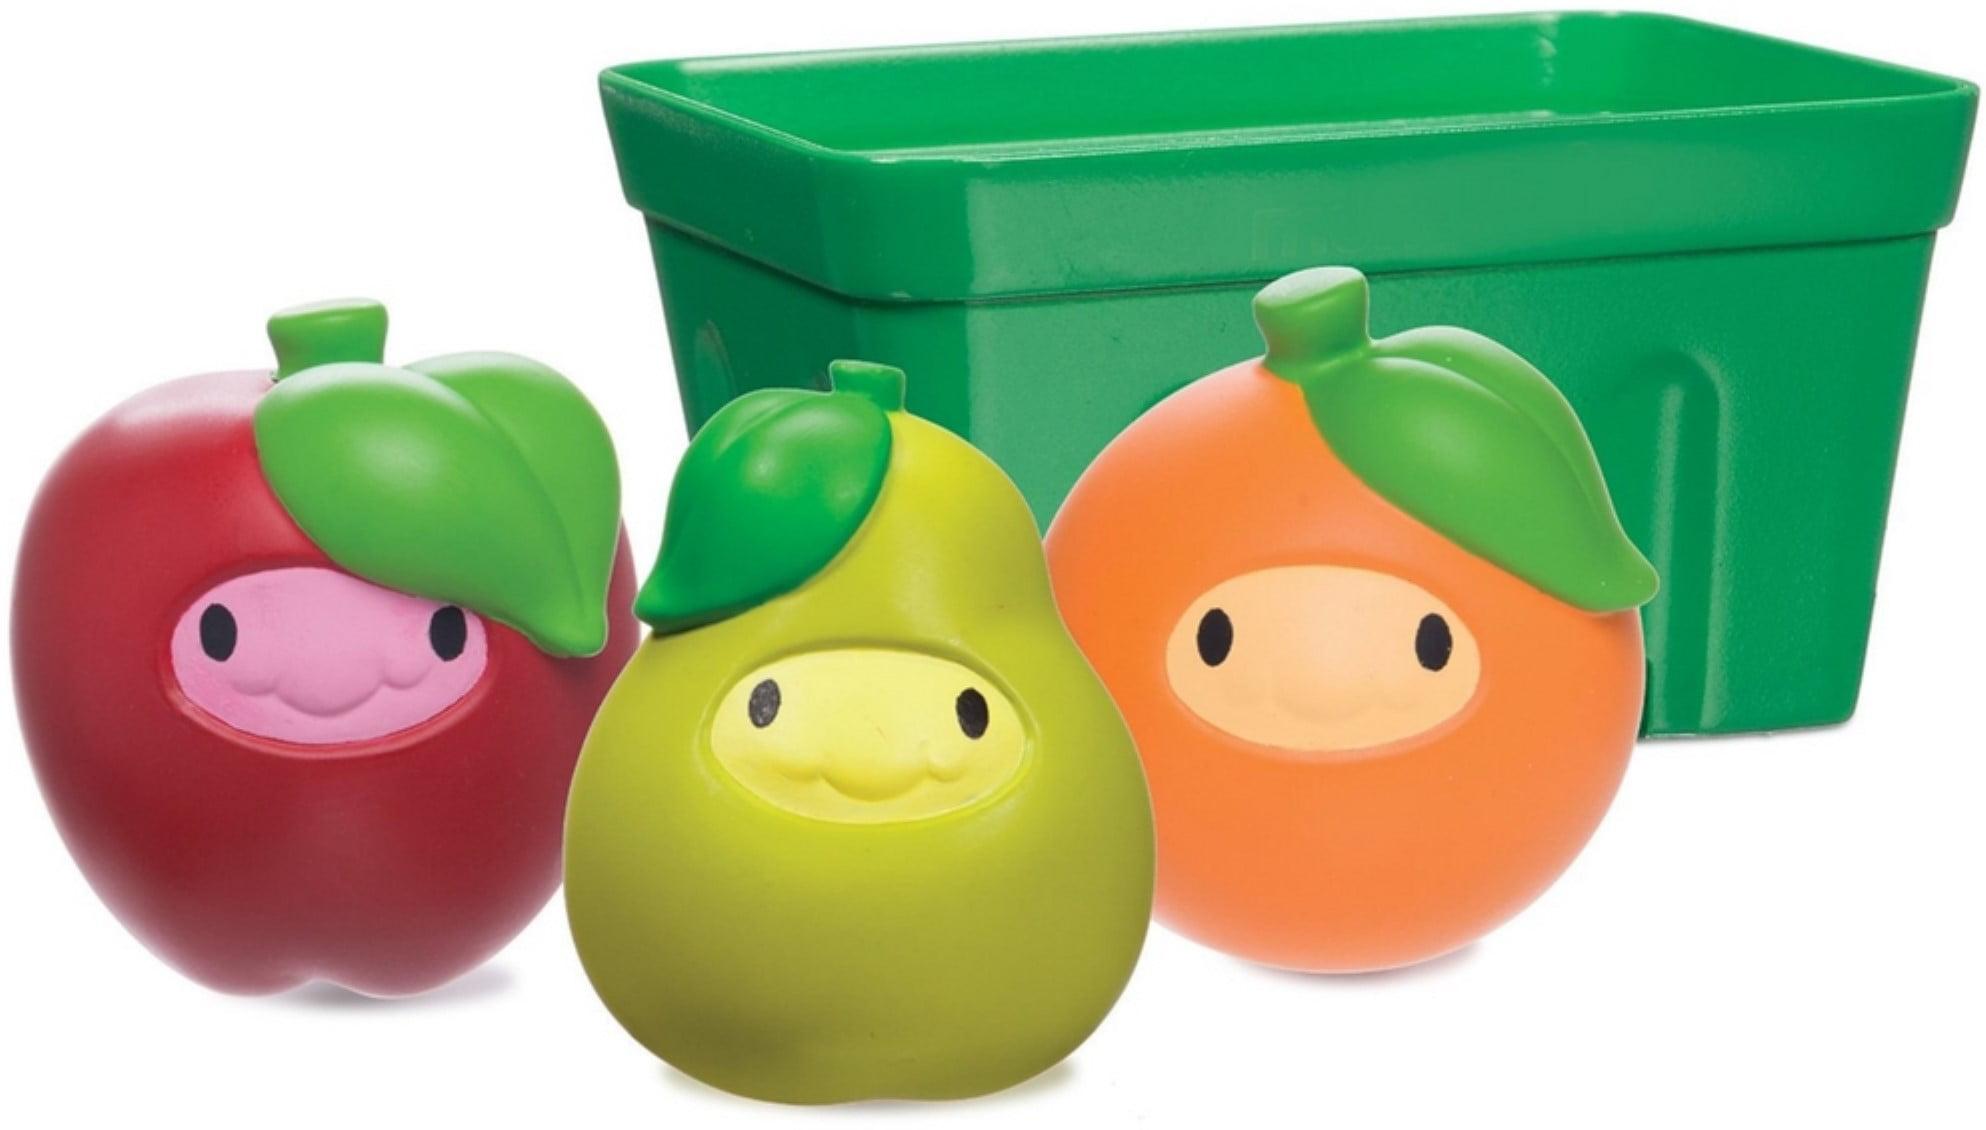 Munchkin Squirt & Strain Fruity Friends Basket Bath Toy 1 ea (Pack of 6) by Munchkin